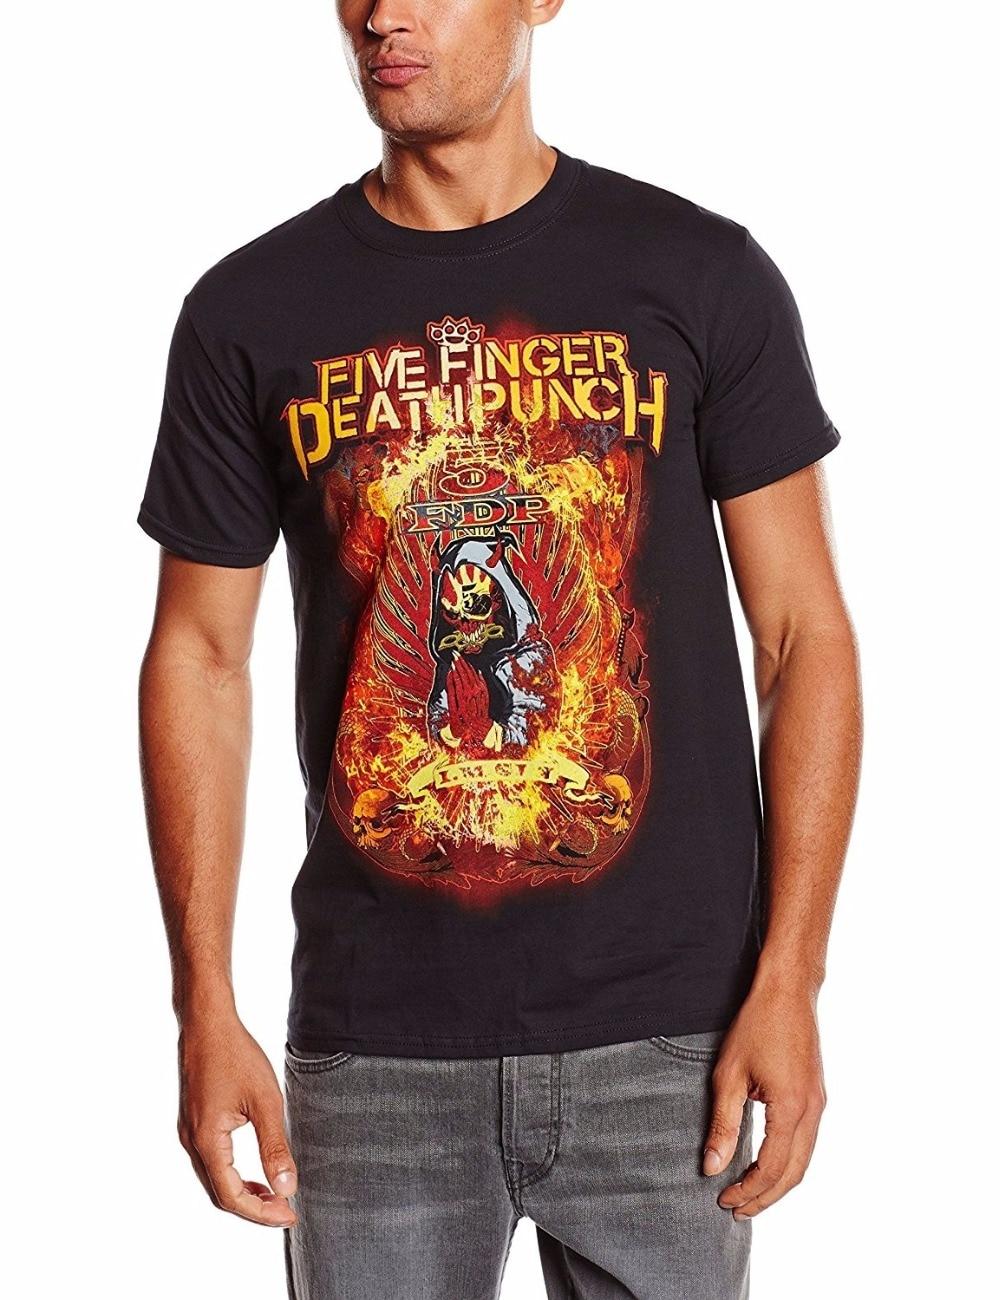 Cheap Men T-Shirt Fashion Shirt Five Finger Death Punch Mens Burn In Sin Short Sleeve T-Shirt